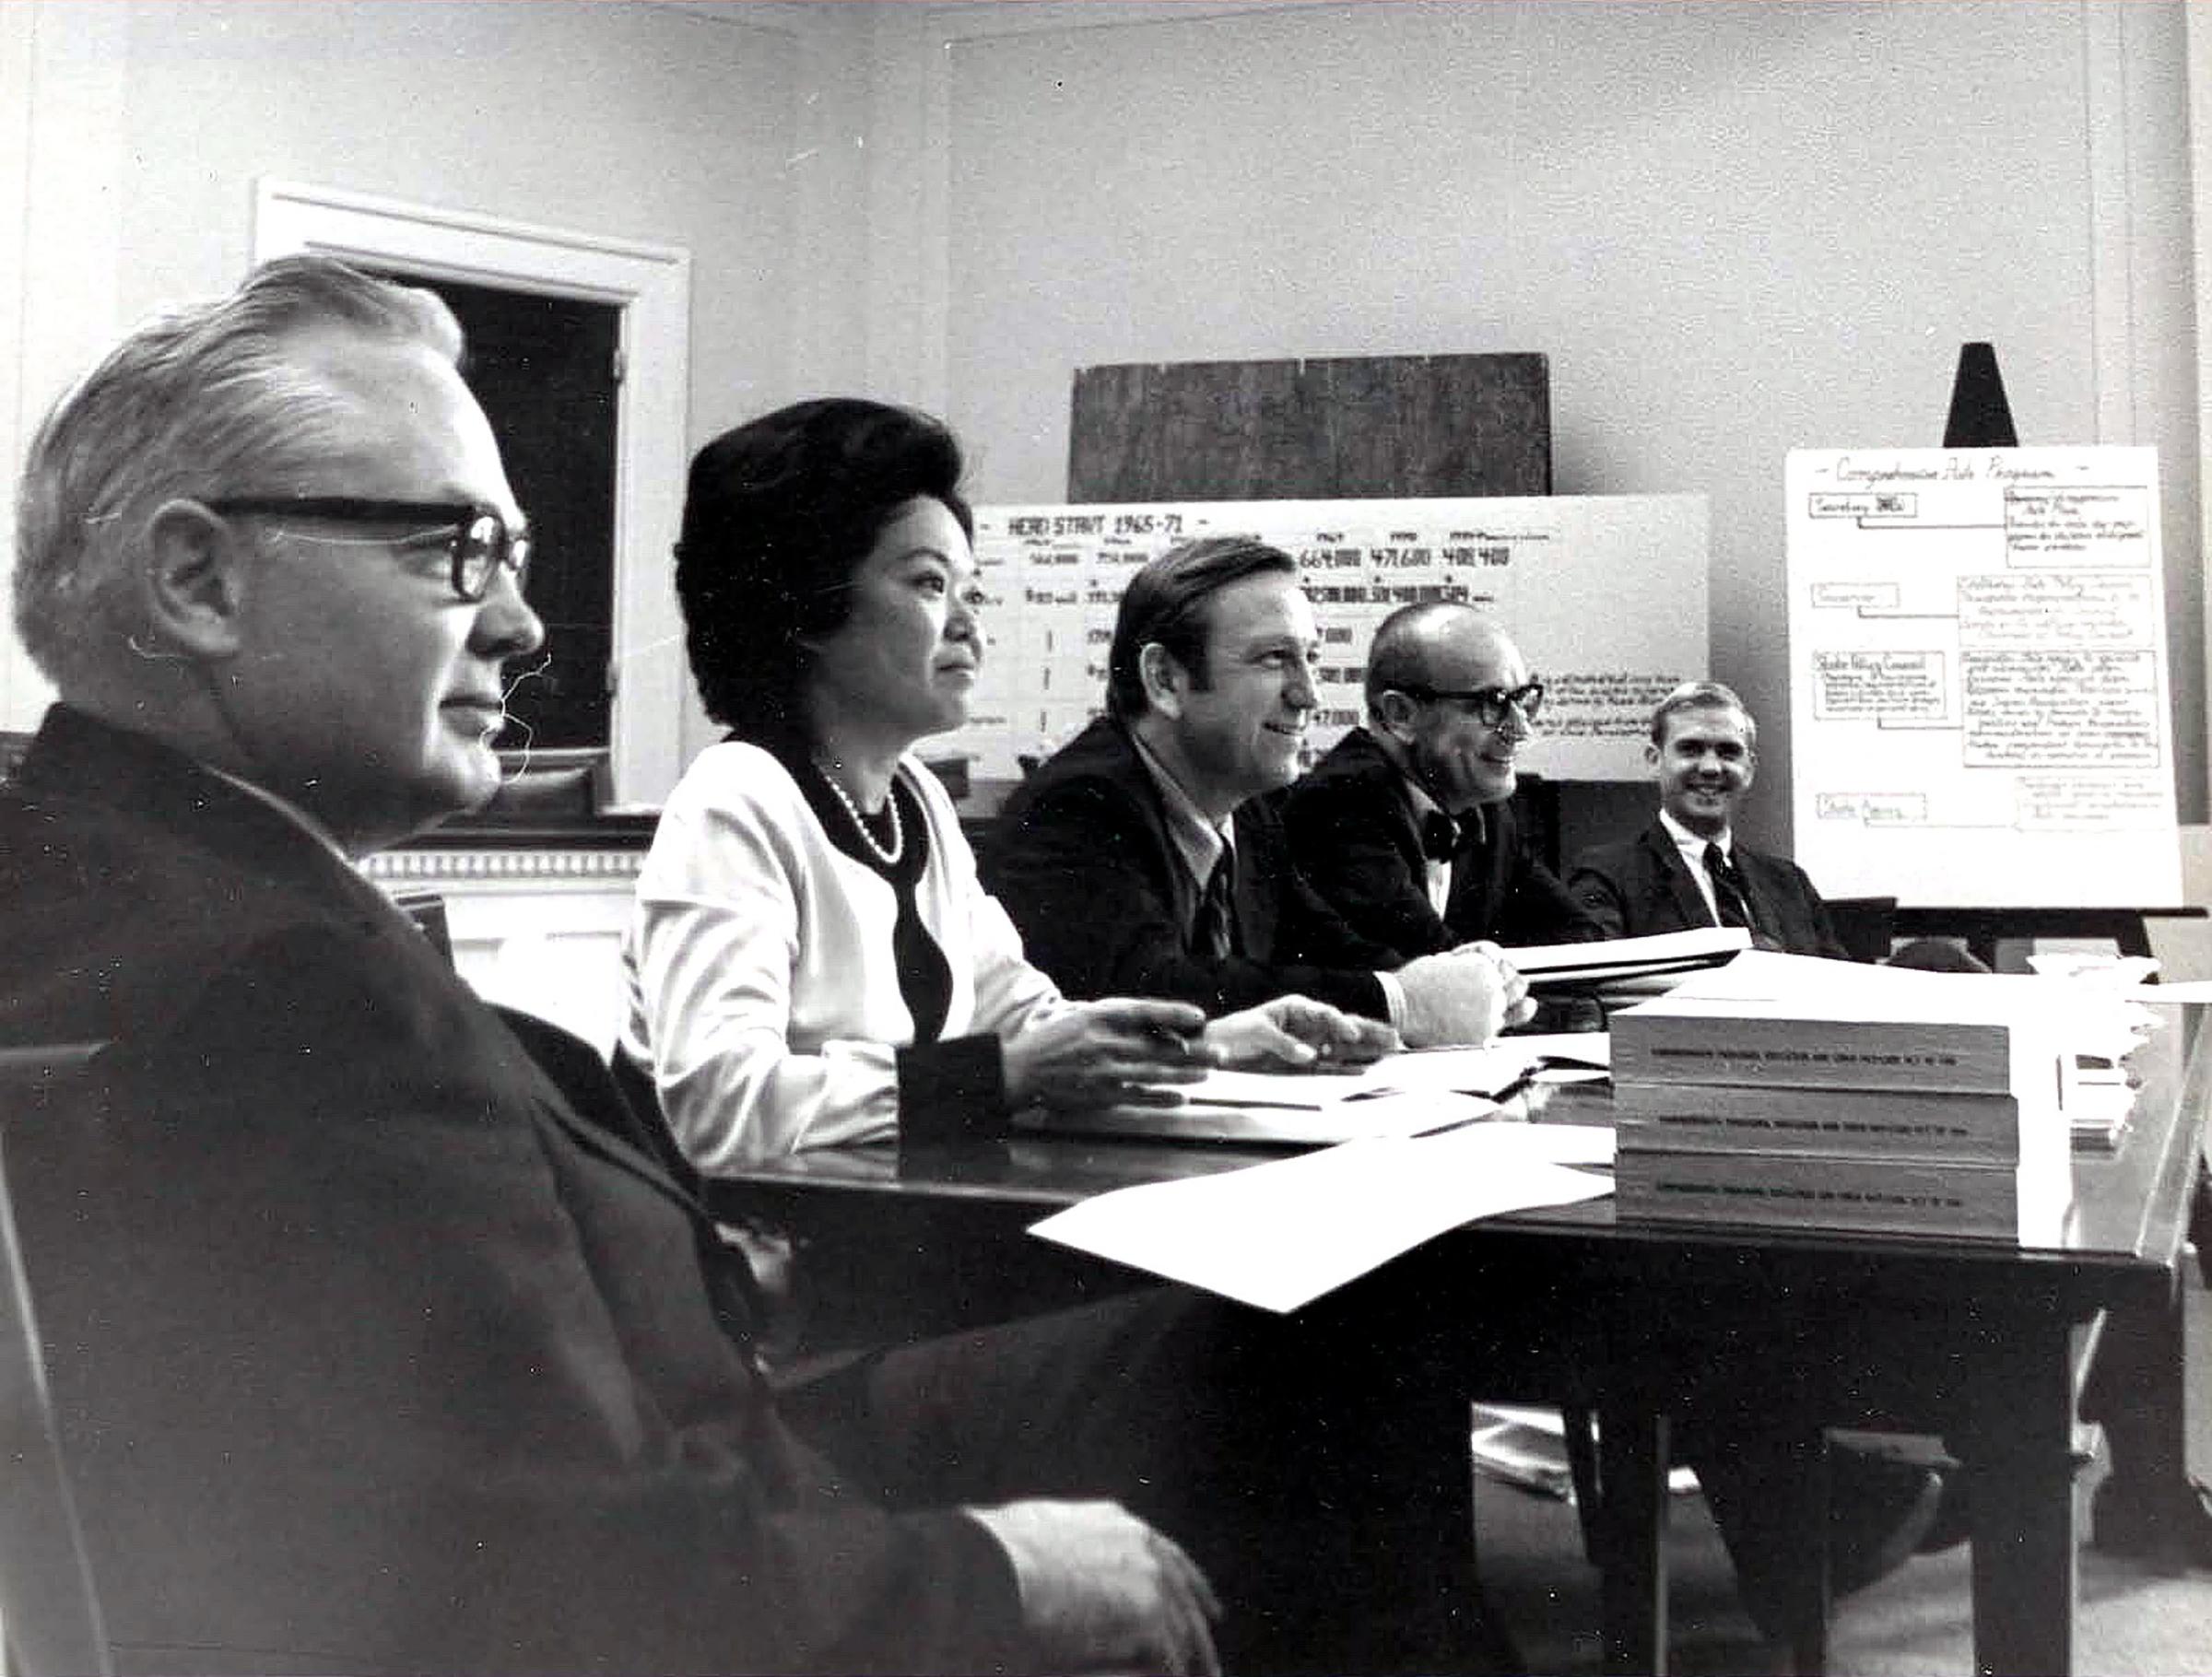 Patsy Takemoto Mink attending a subcommittee hearing/markup around 1971-1972.